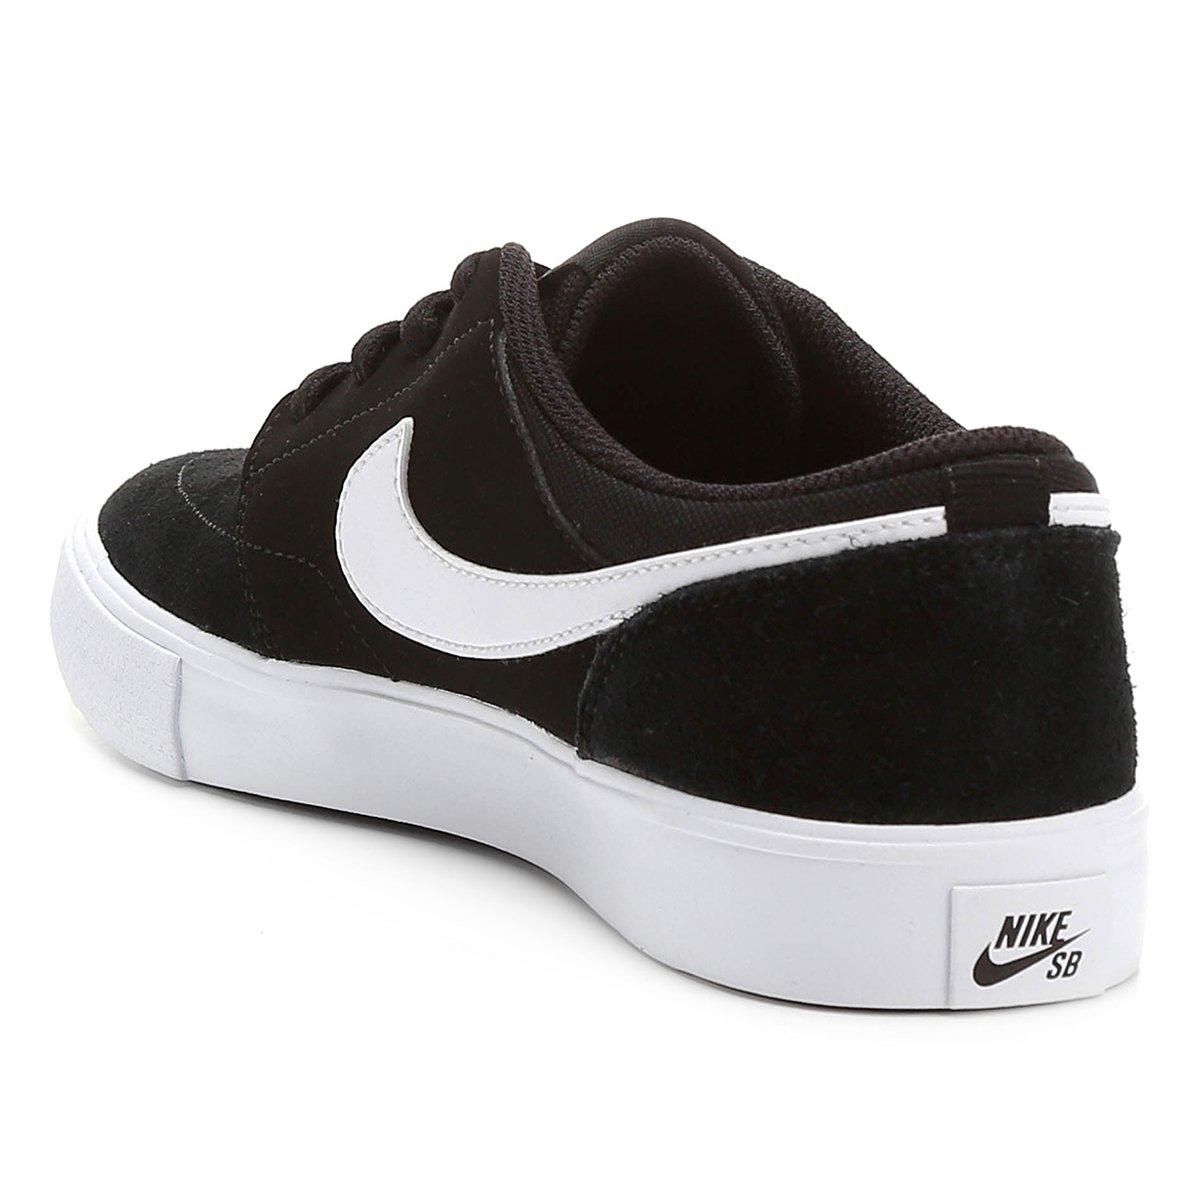 Tênis Nike SB Portmore II Infantil - Compre Agora  846aafb0459a6